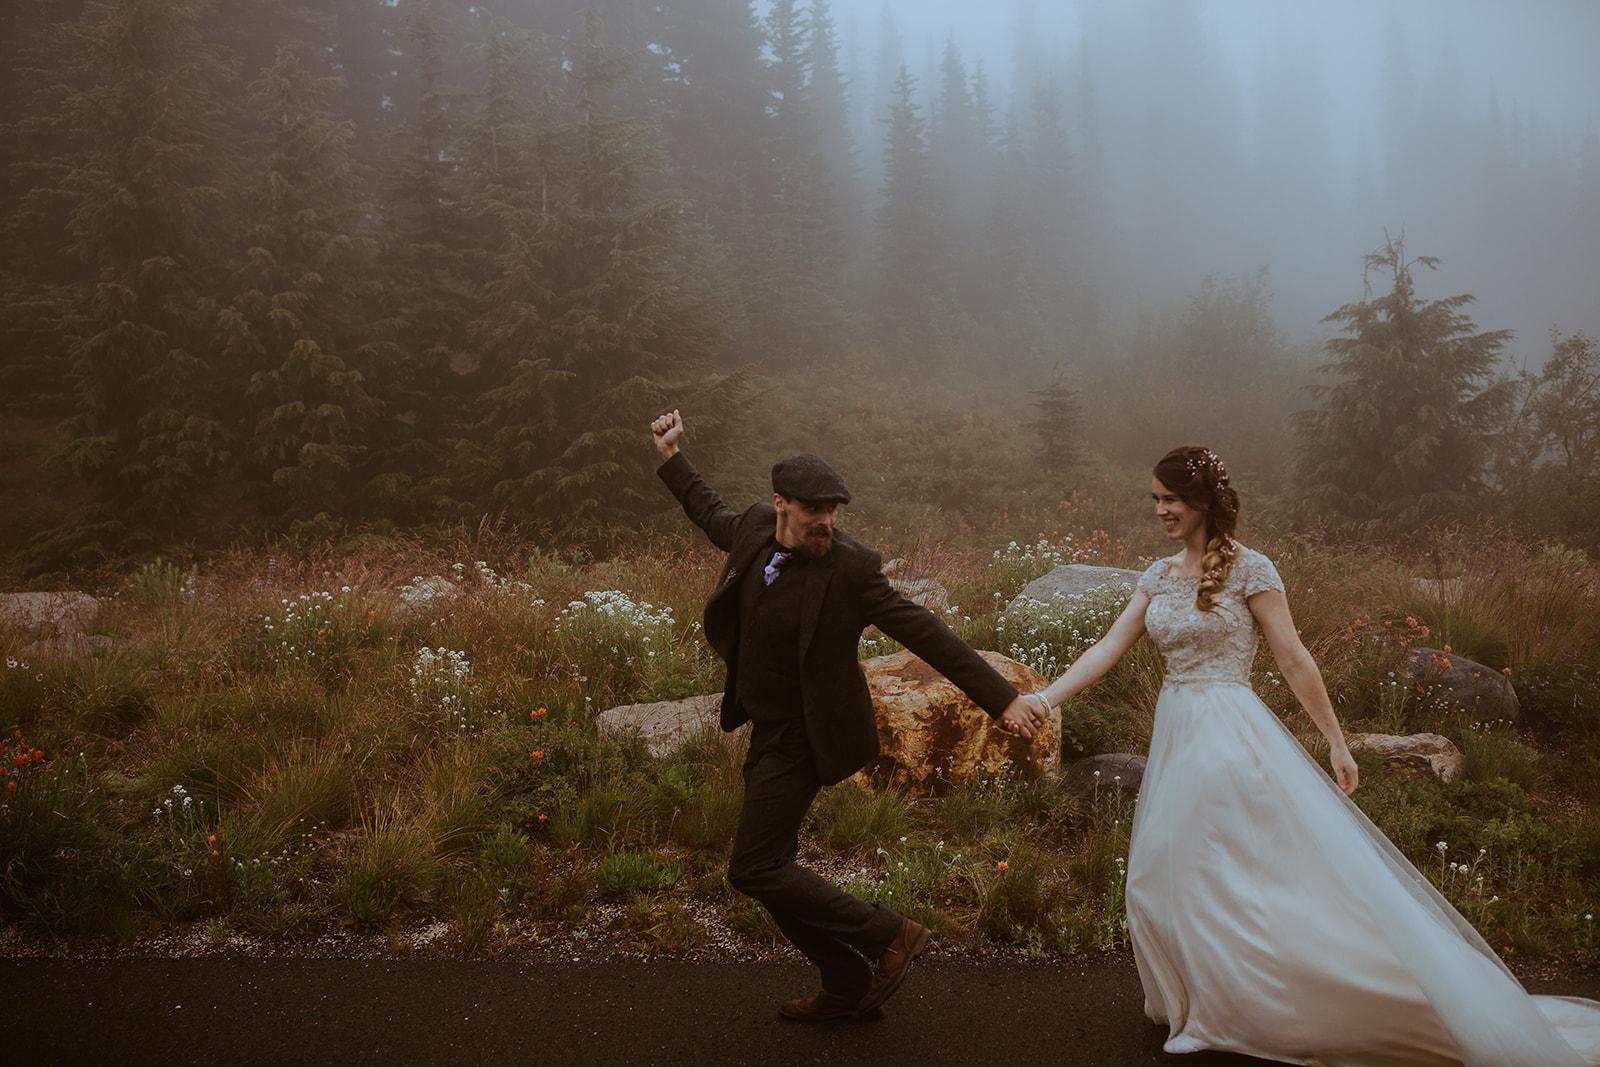 mount-rainier-cabin-elopement-megan-gallagher-photography_(440_of_568).jpg